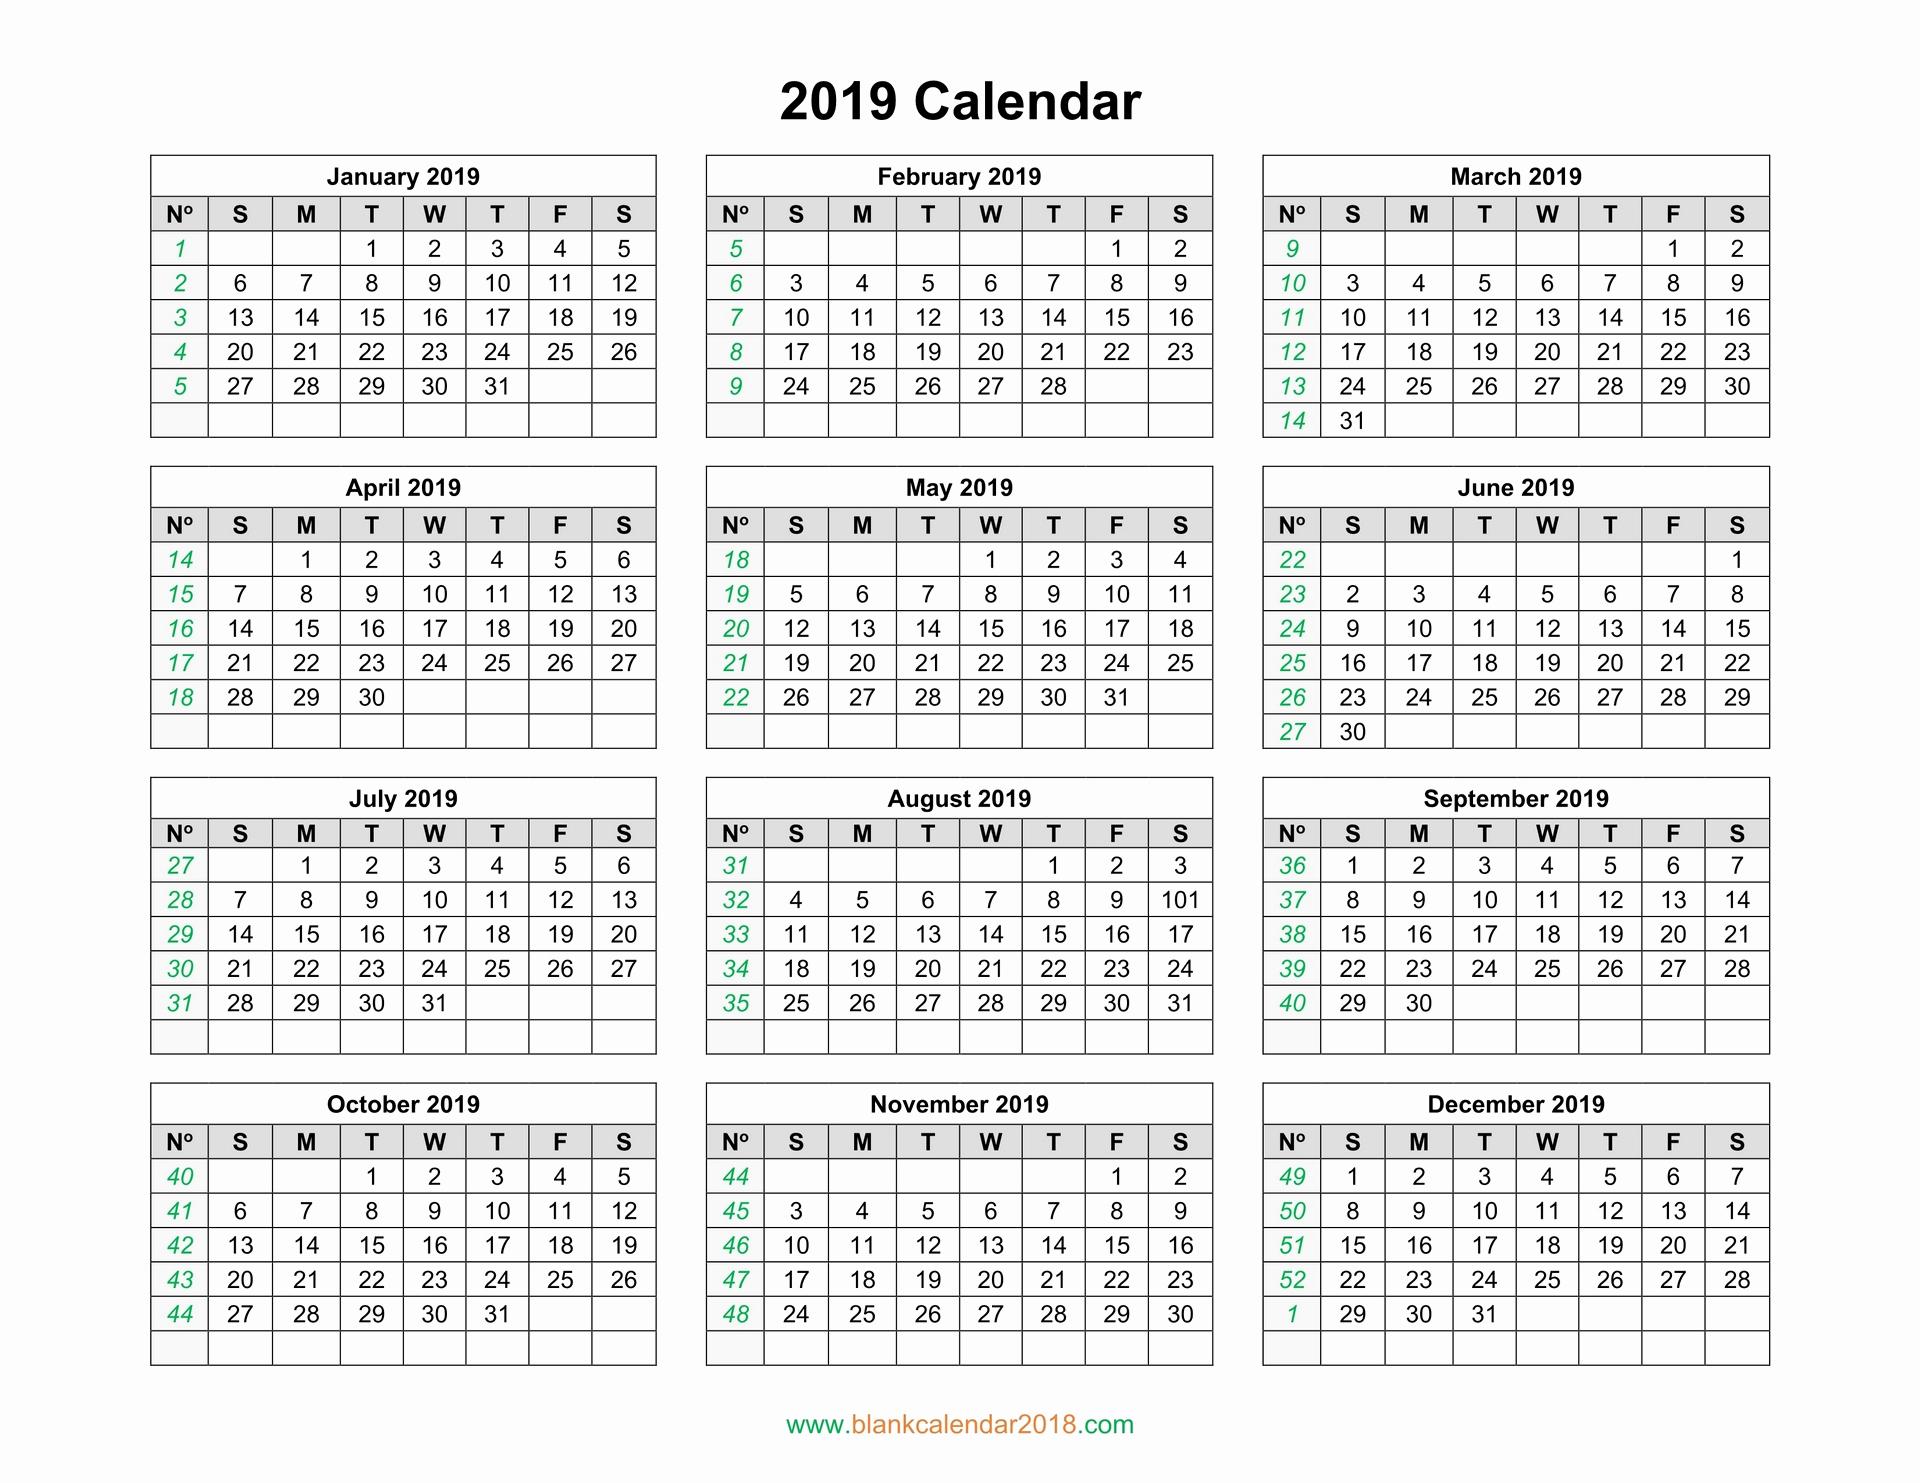 Blank Calendar Template 2019 Unique Blank Calendar 2019